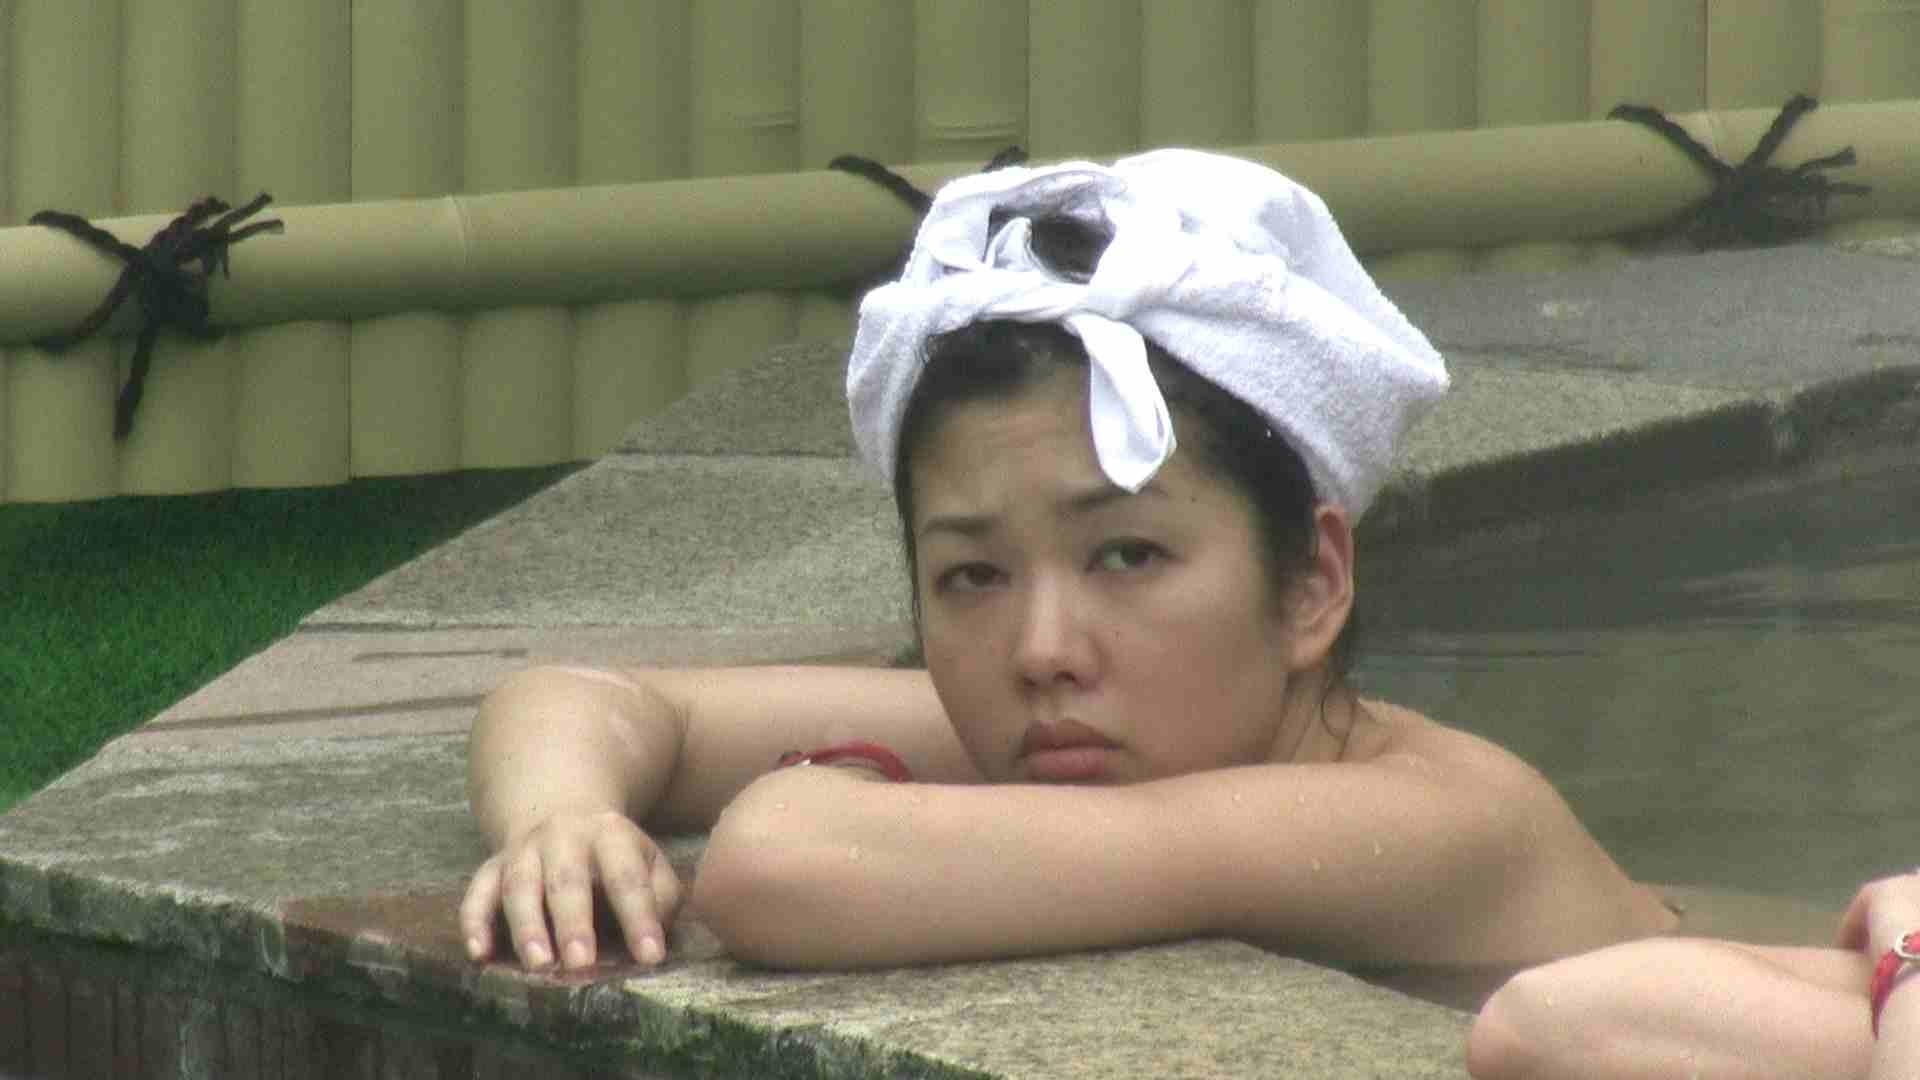 Aquaな露天風呂Vol.192 露天風呂 | OLのエロ生活  79連発 22